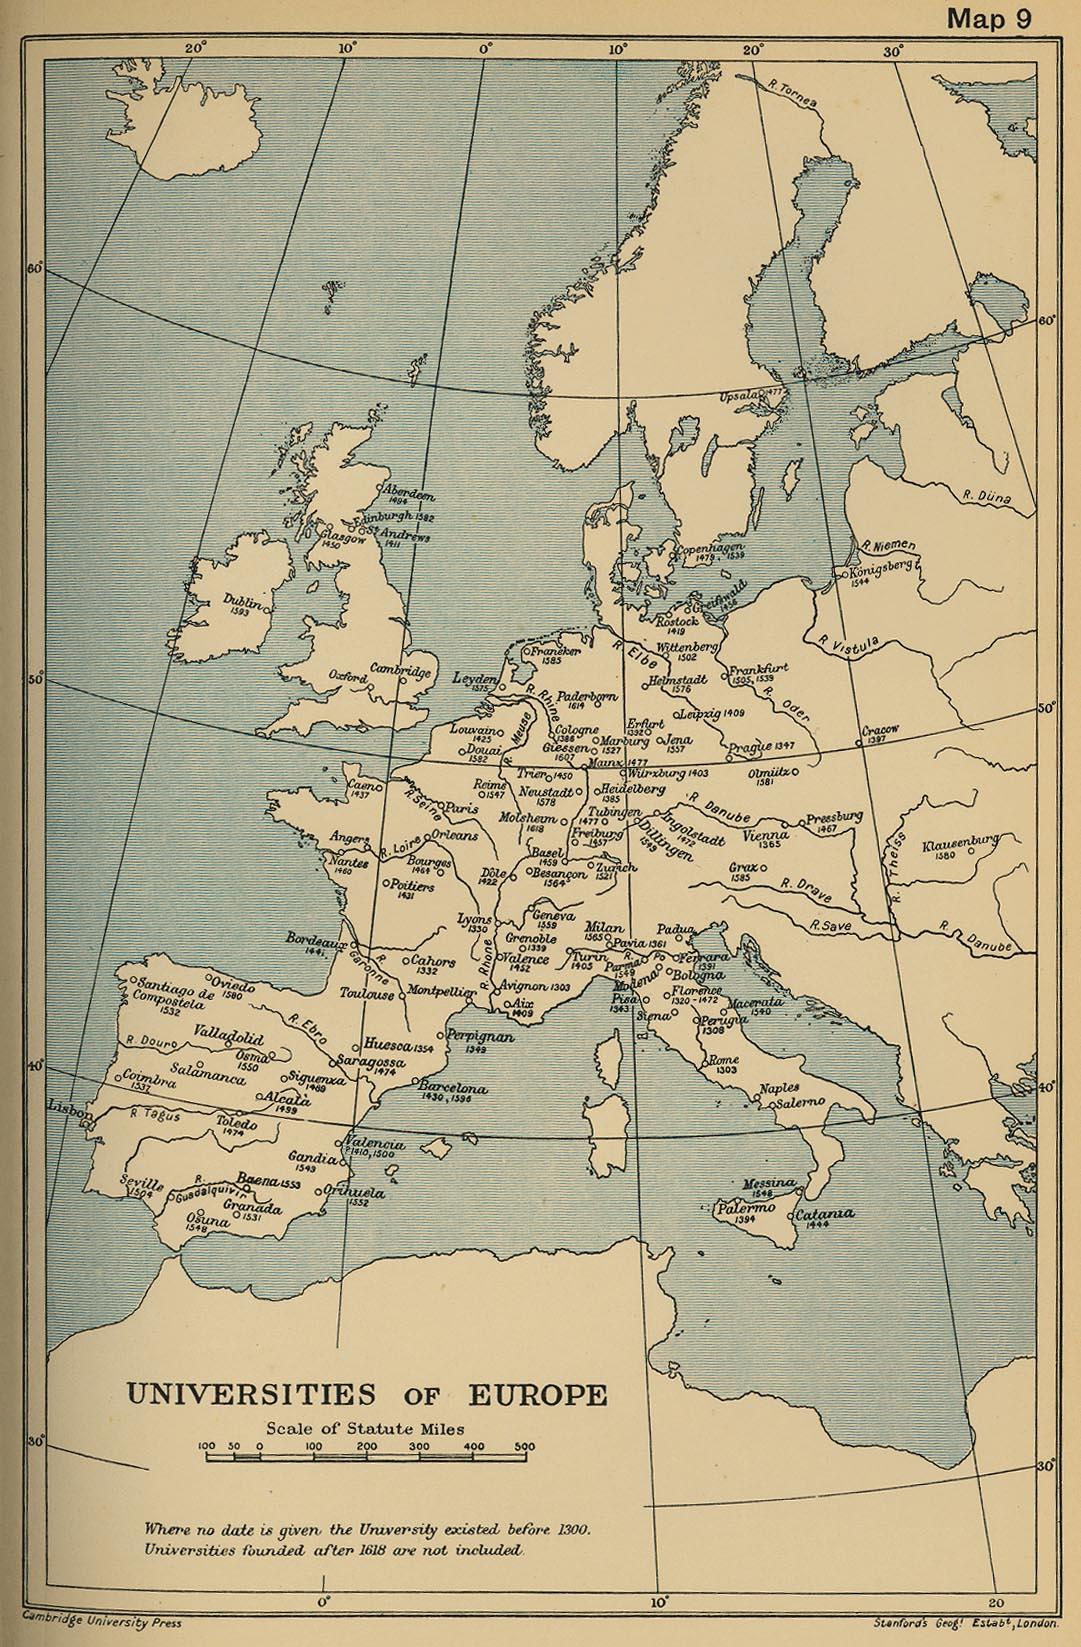 Universities in Europe until 1618